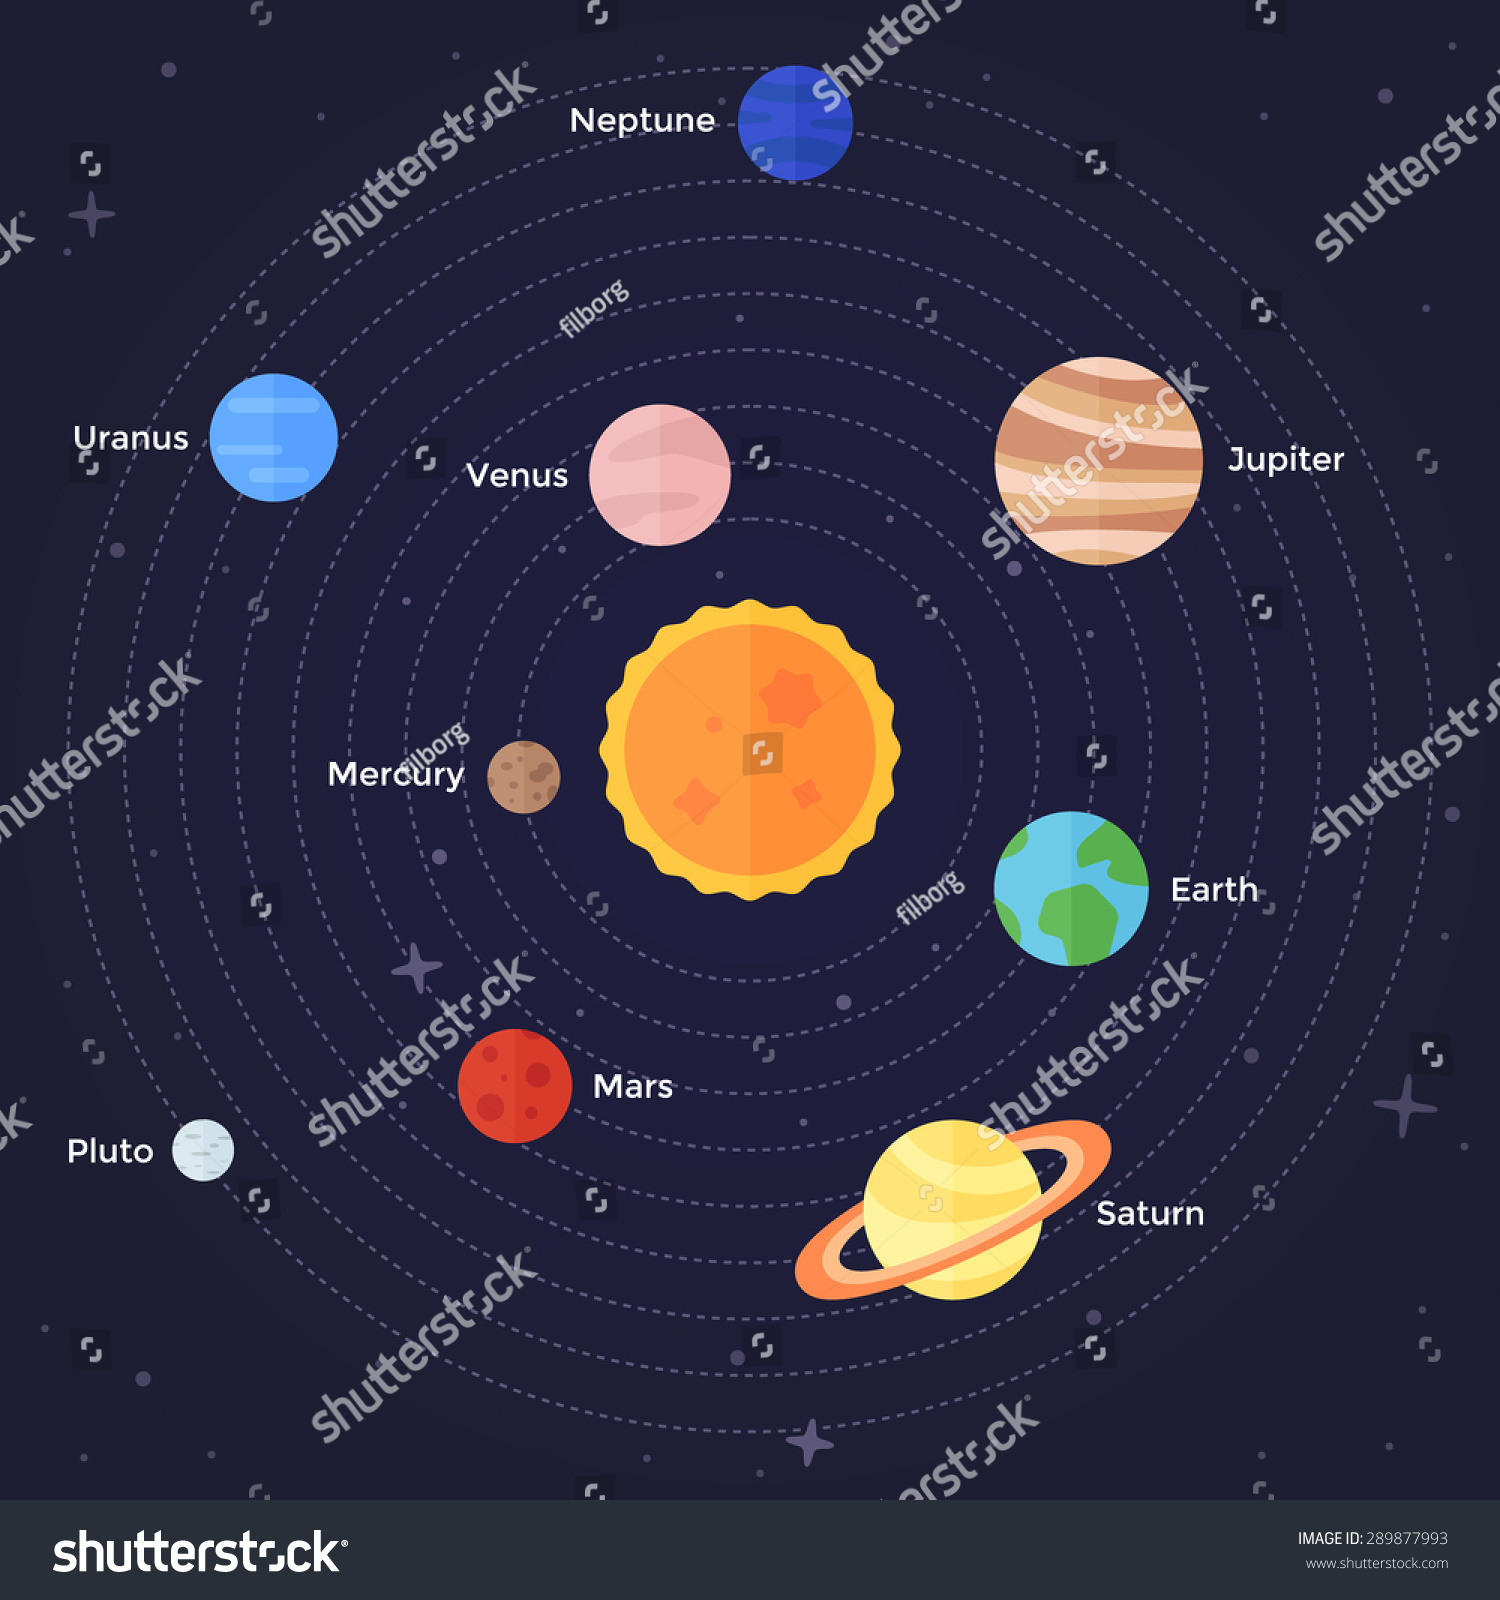 hight resolution of mercury venus earth mars jupiter saturn uranus neptune pluto stars and sun vector flat illustration